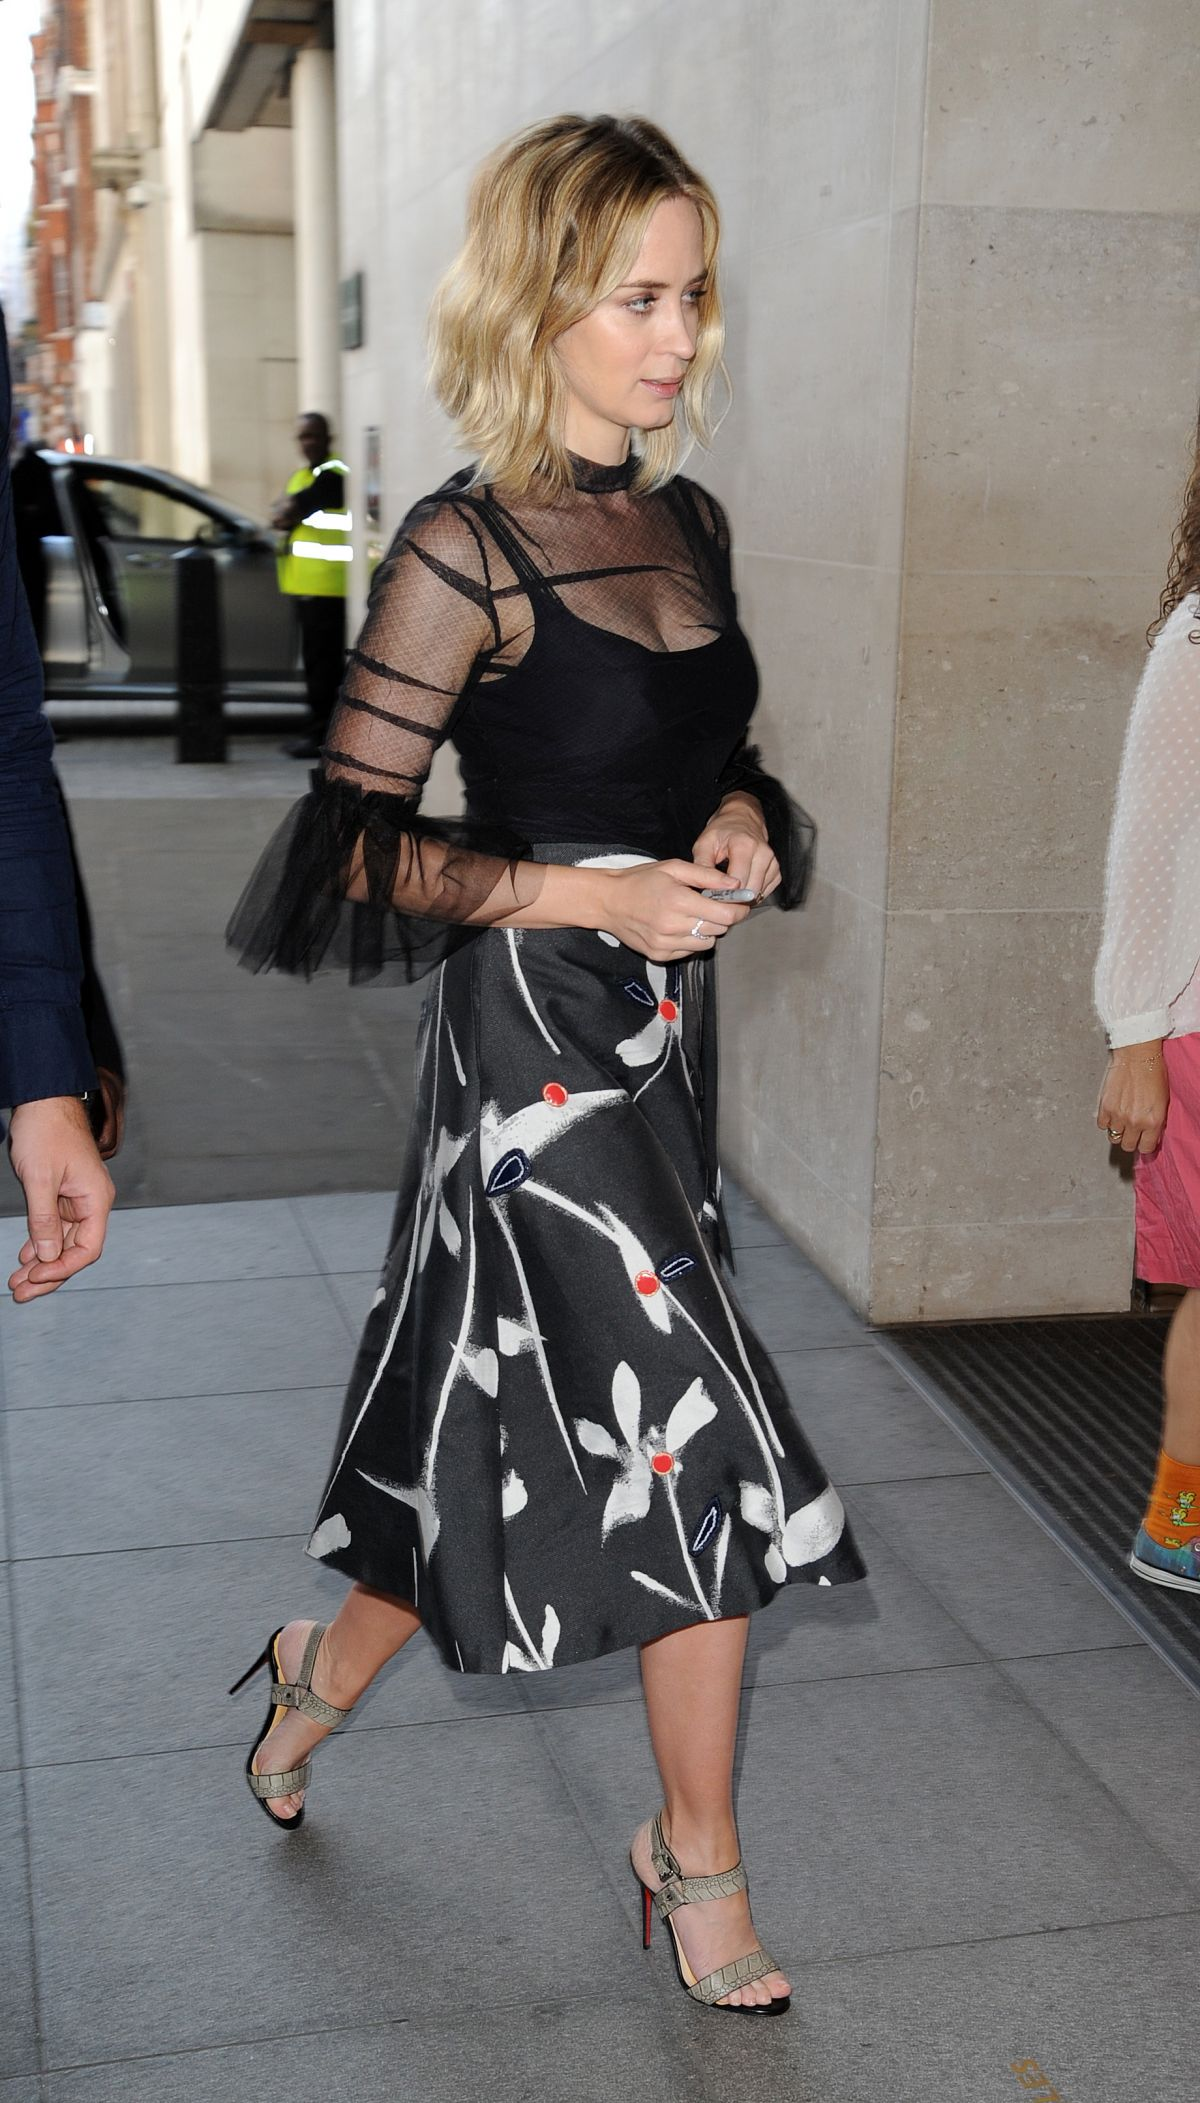 EMILY BLUNT Arrives at BBC Radio 1 Studios in London 09/20/2016